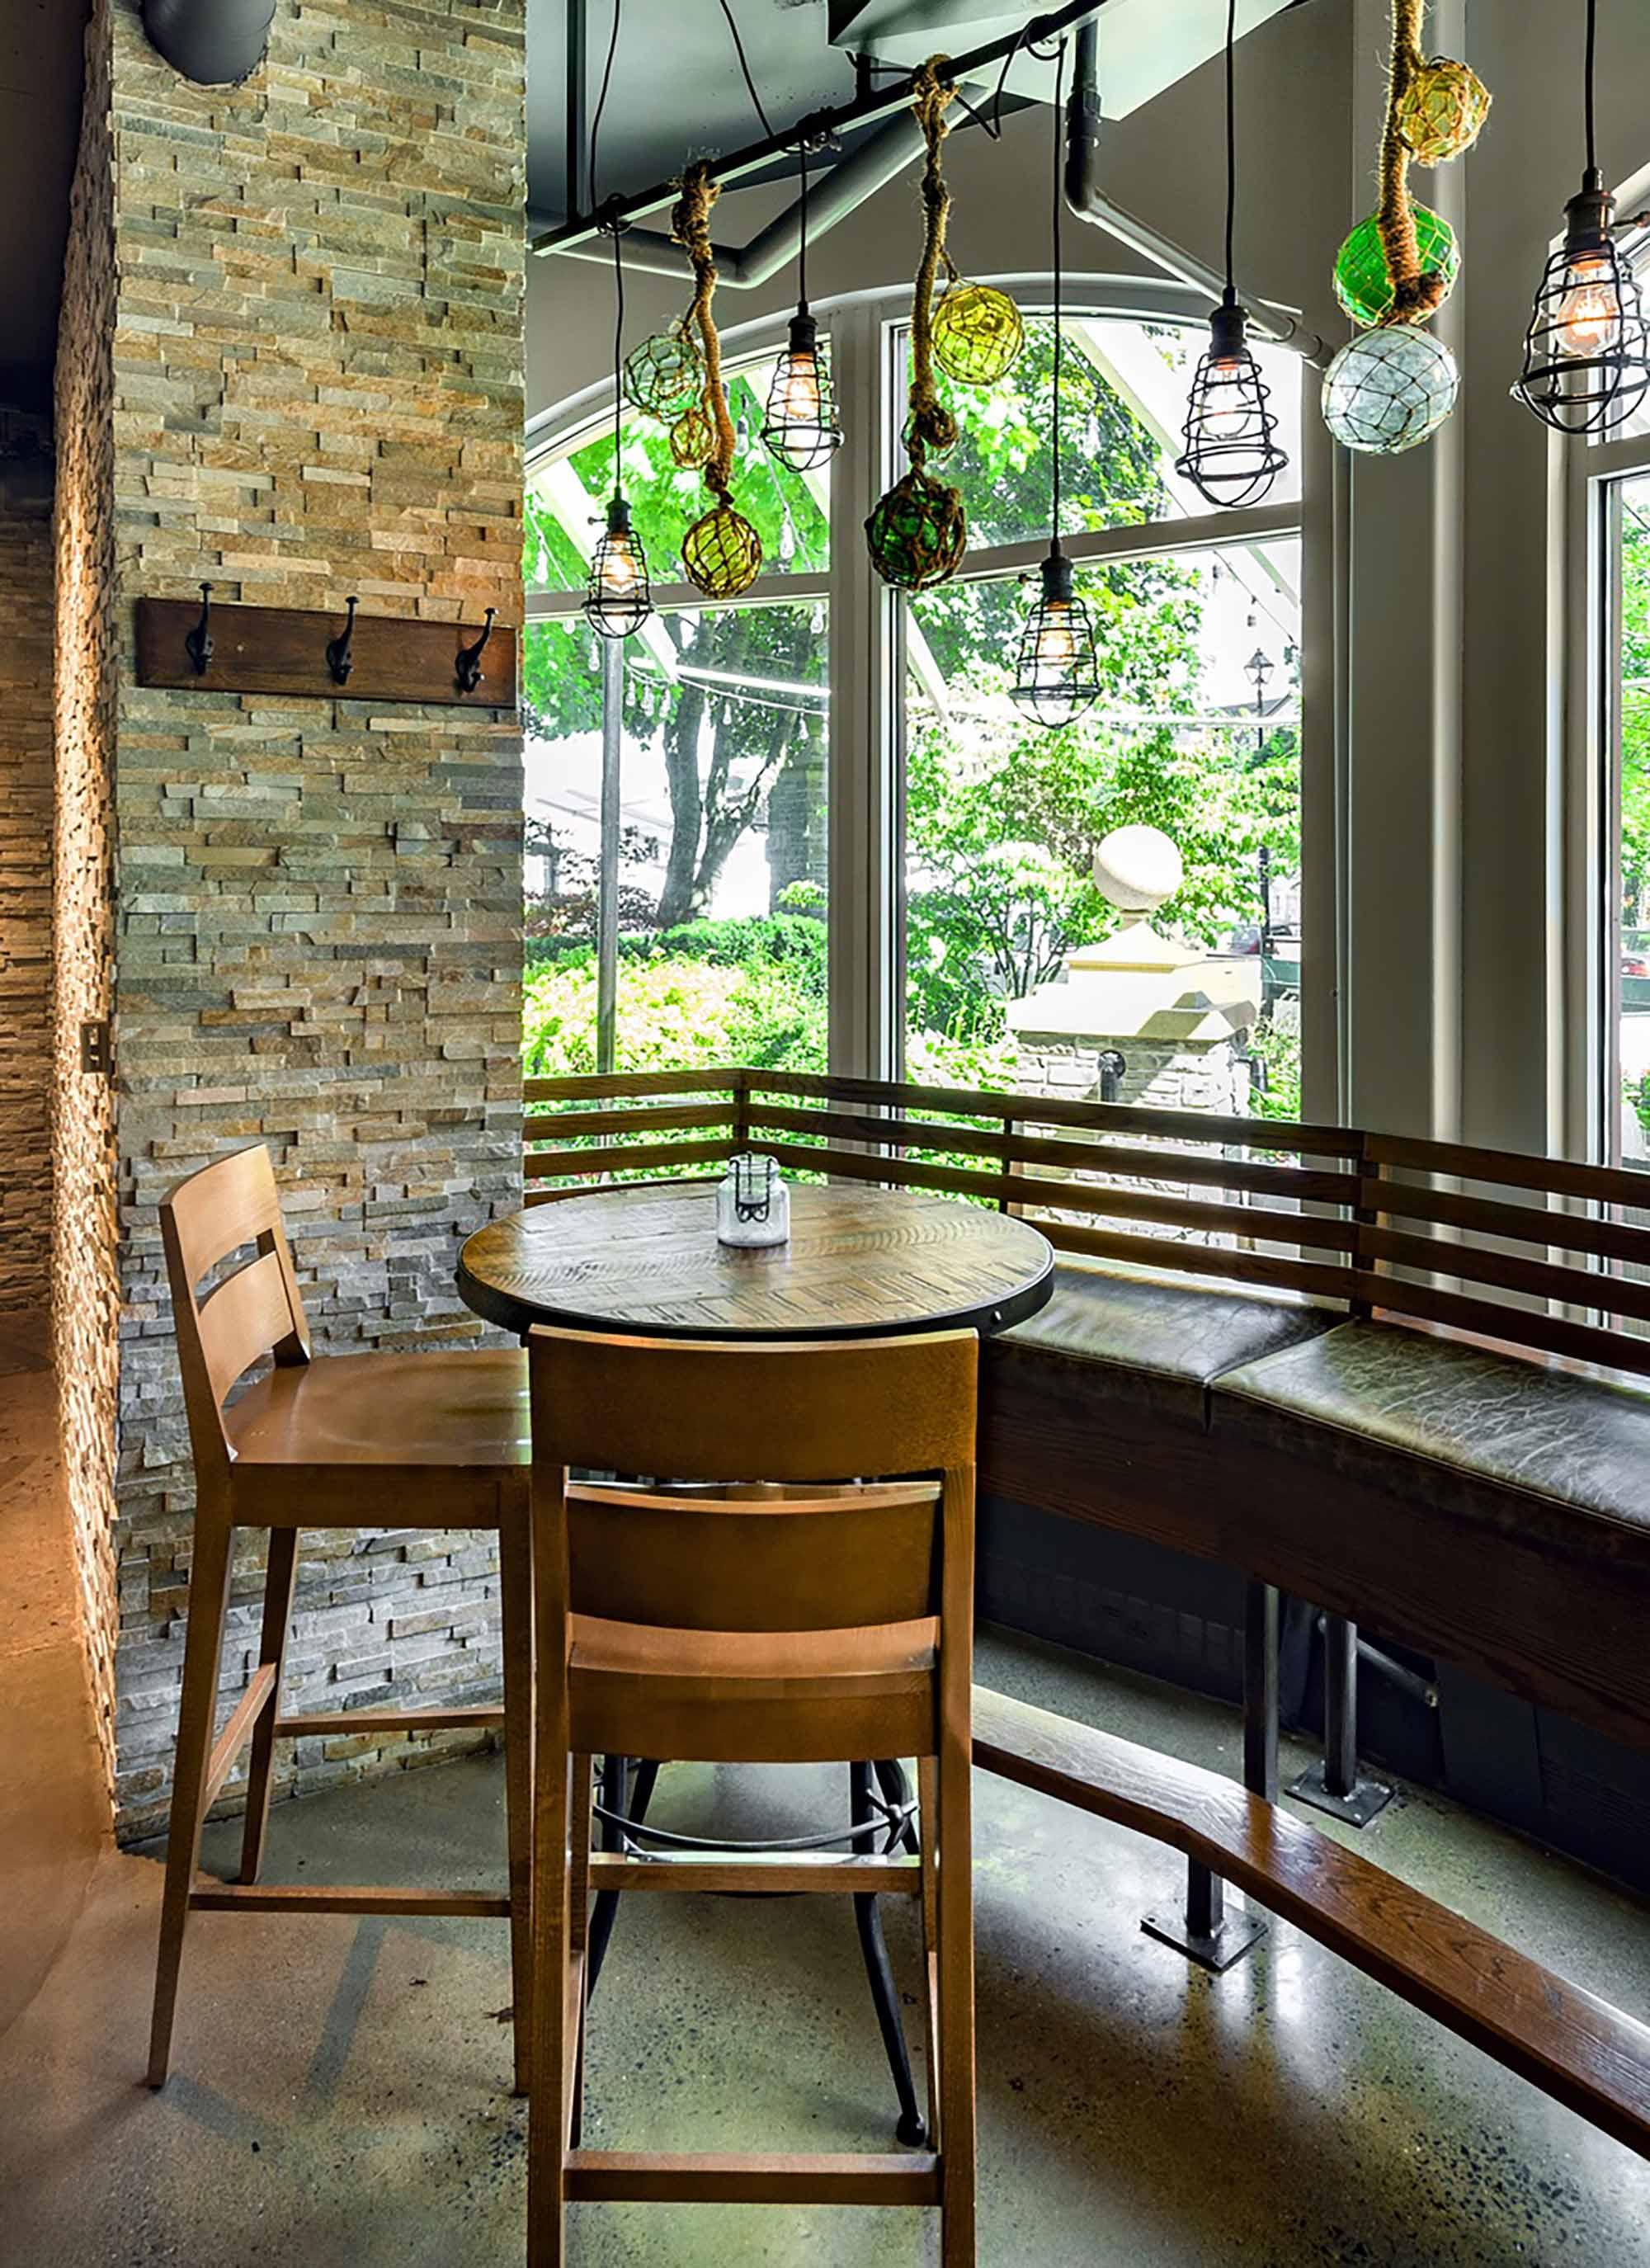 interior-design-seafood-restuarant-tables.jpg